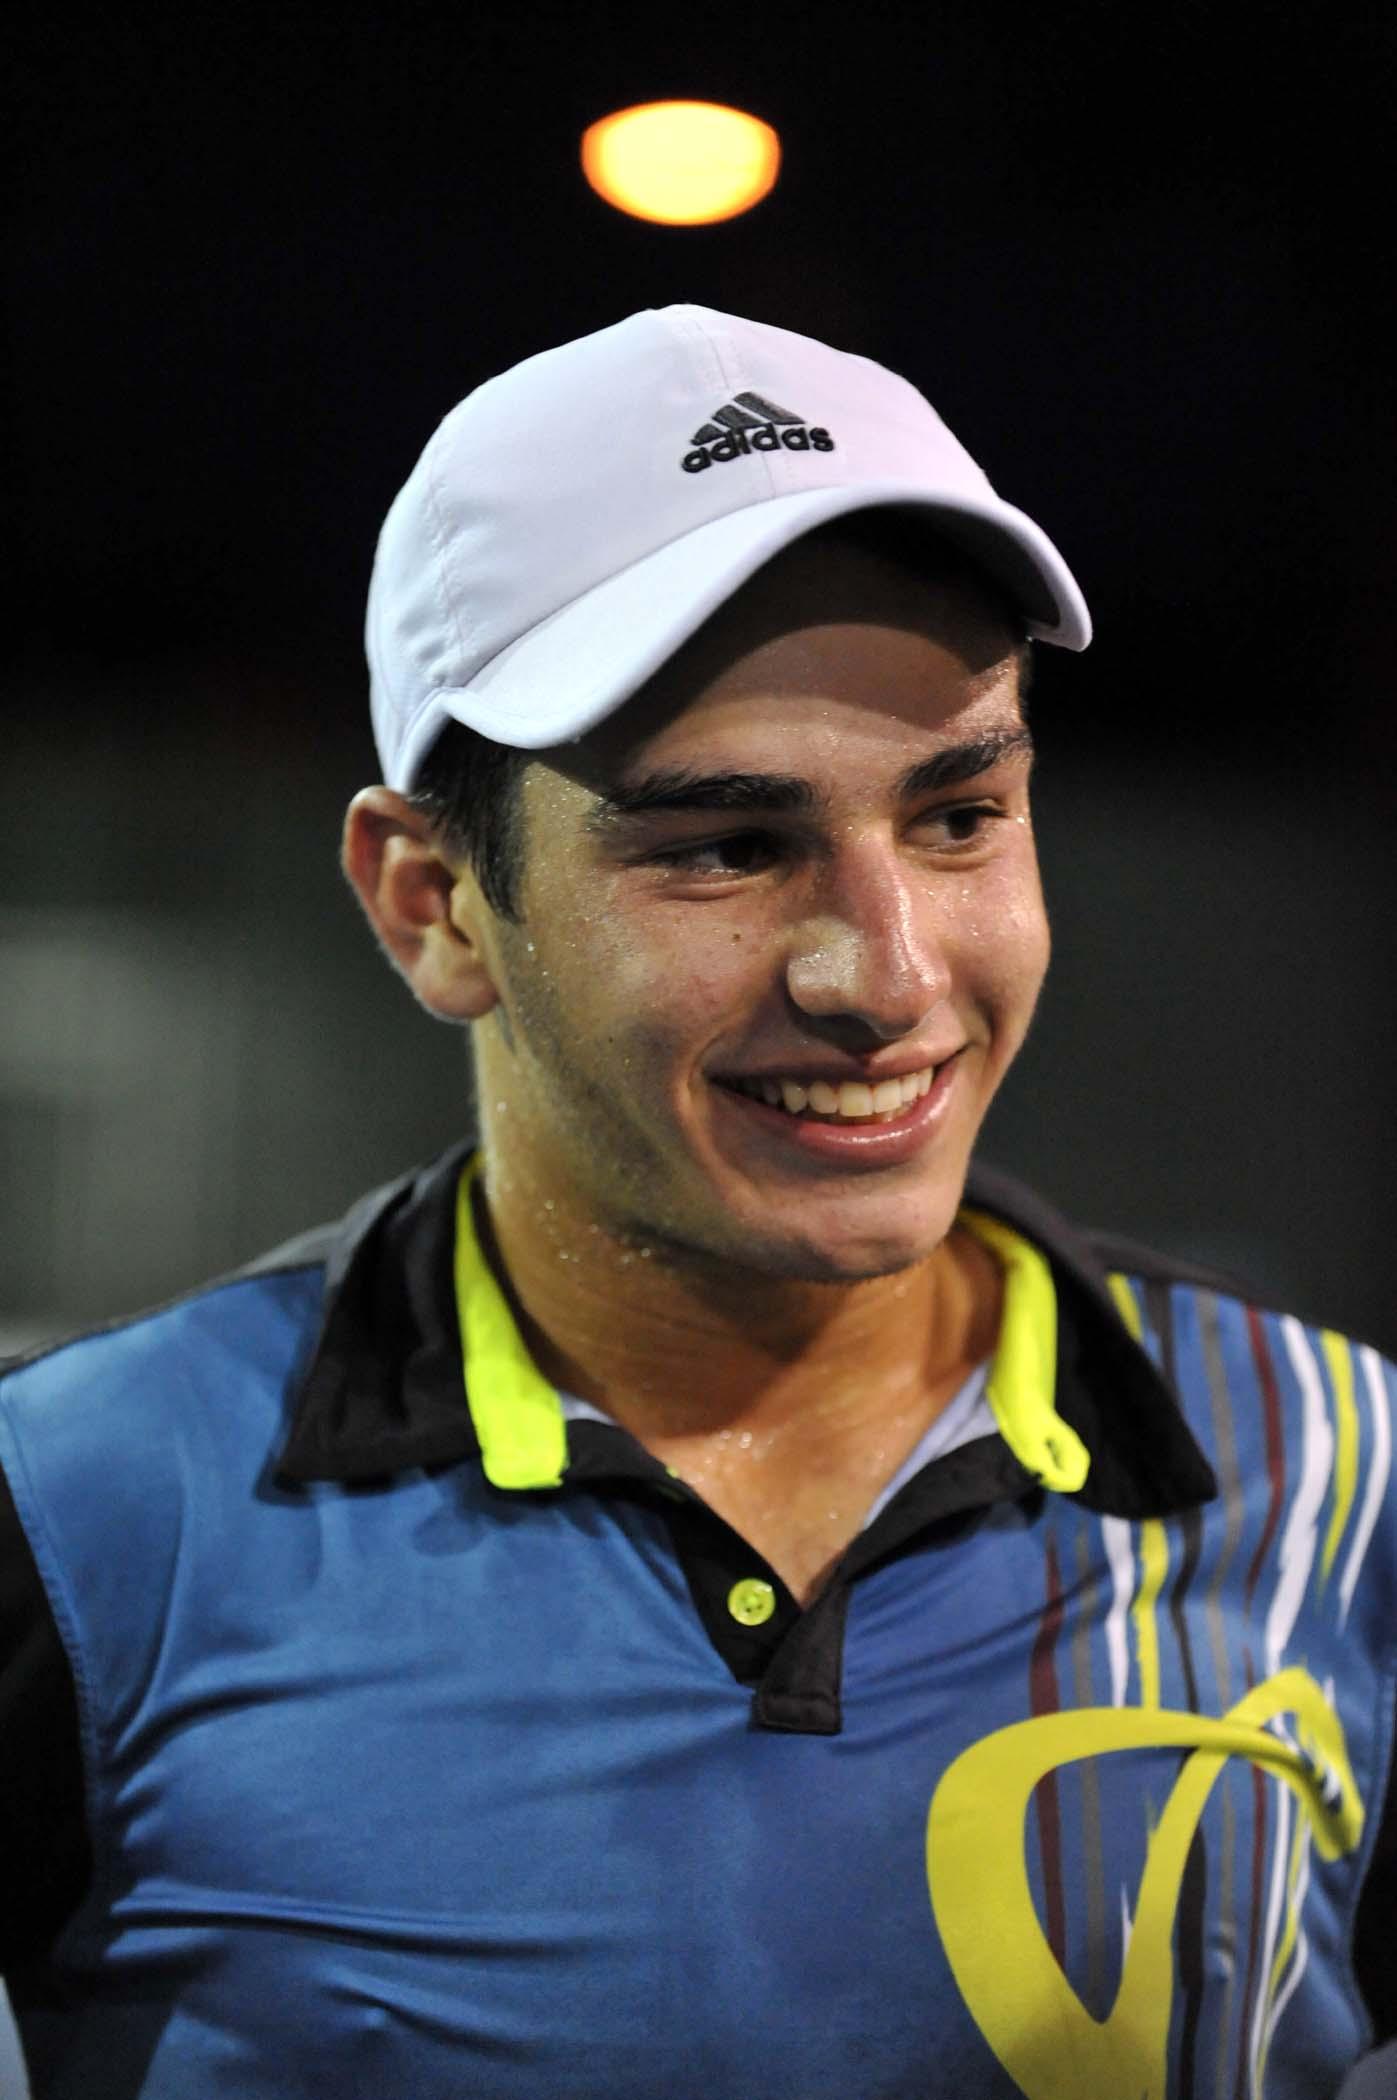 Jugador tenis